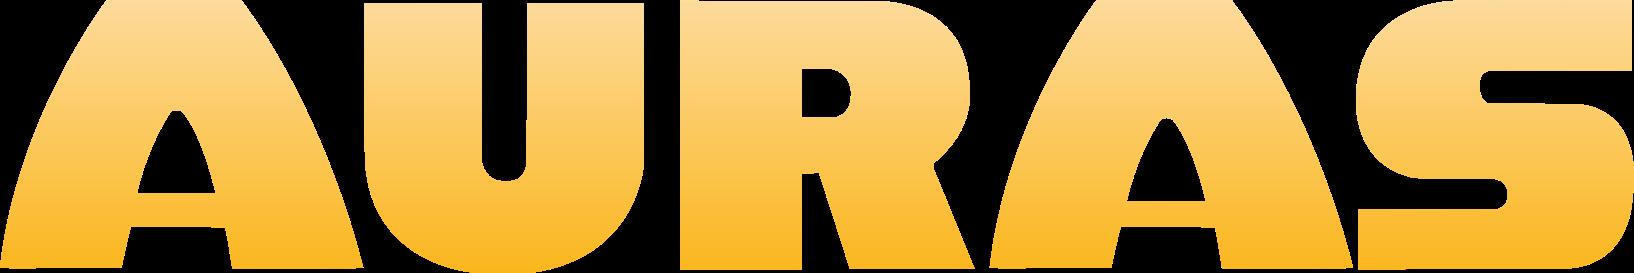 auras-logo